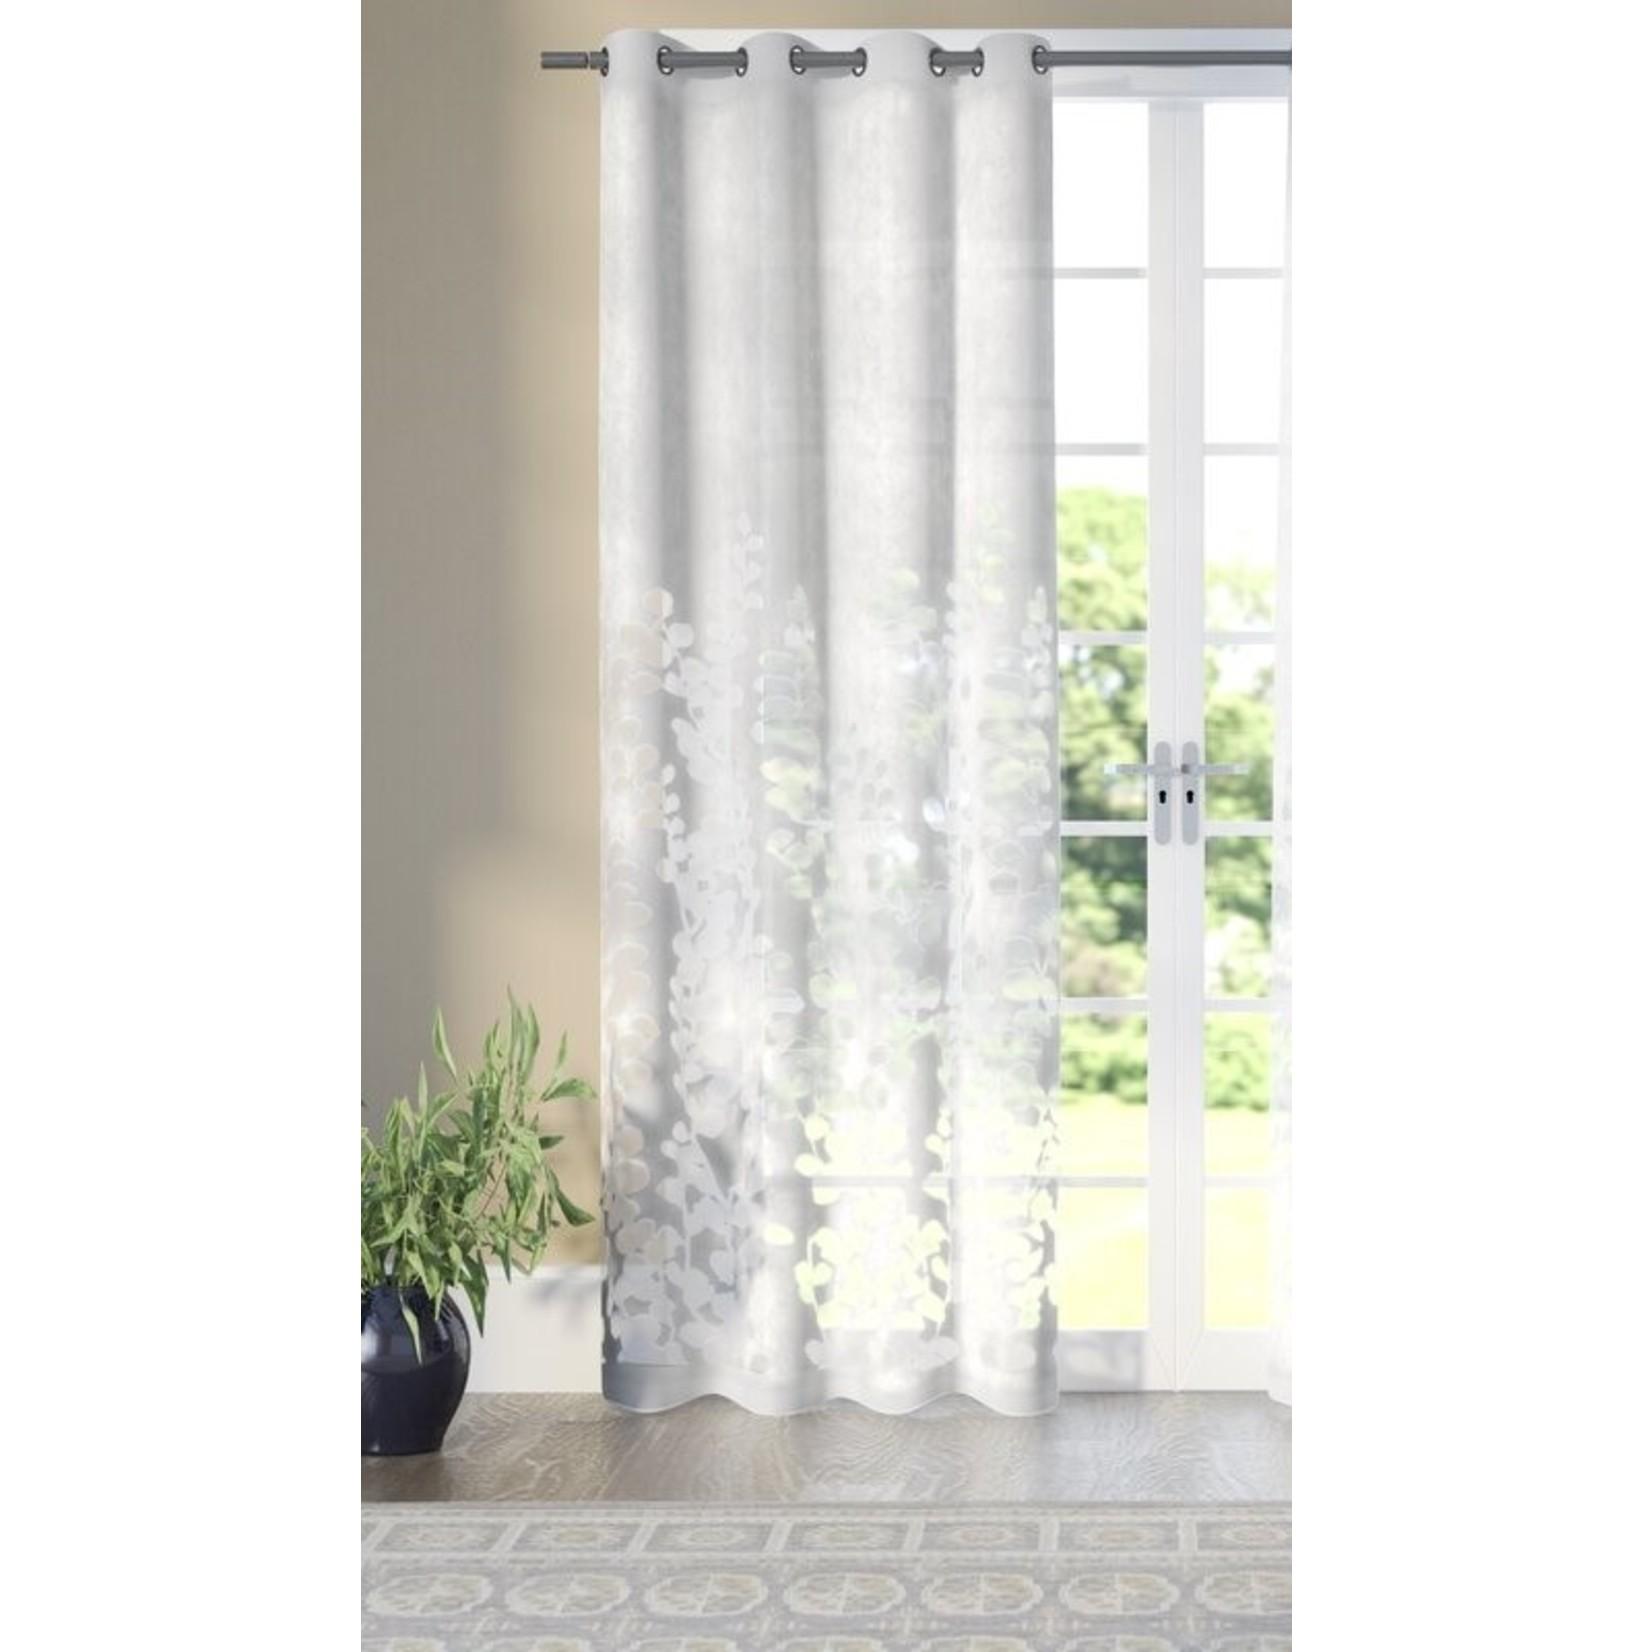 "* 52"" x 96"" - Ryckman Cotton Blend Semi-Sheer Single Grommet Curtain Panel - Single Panel"